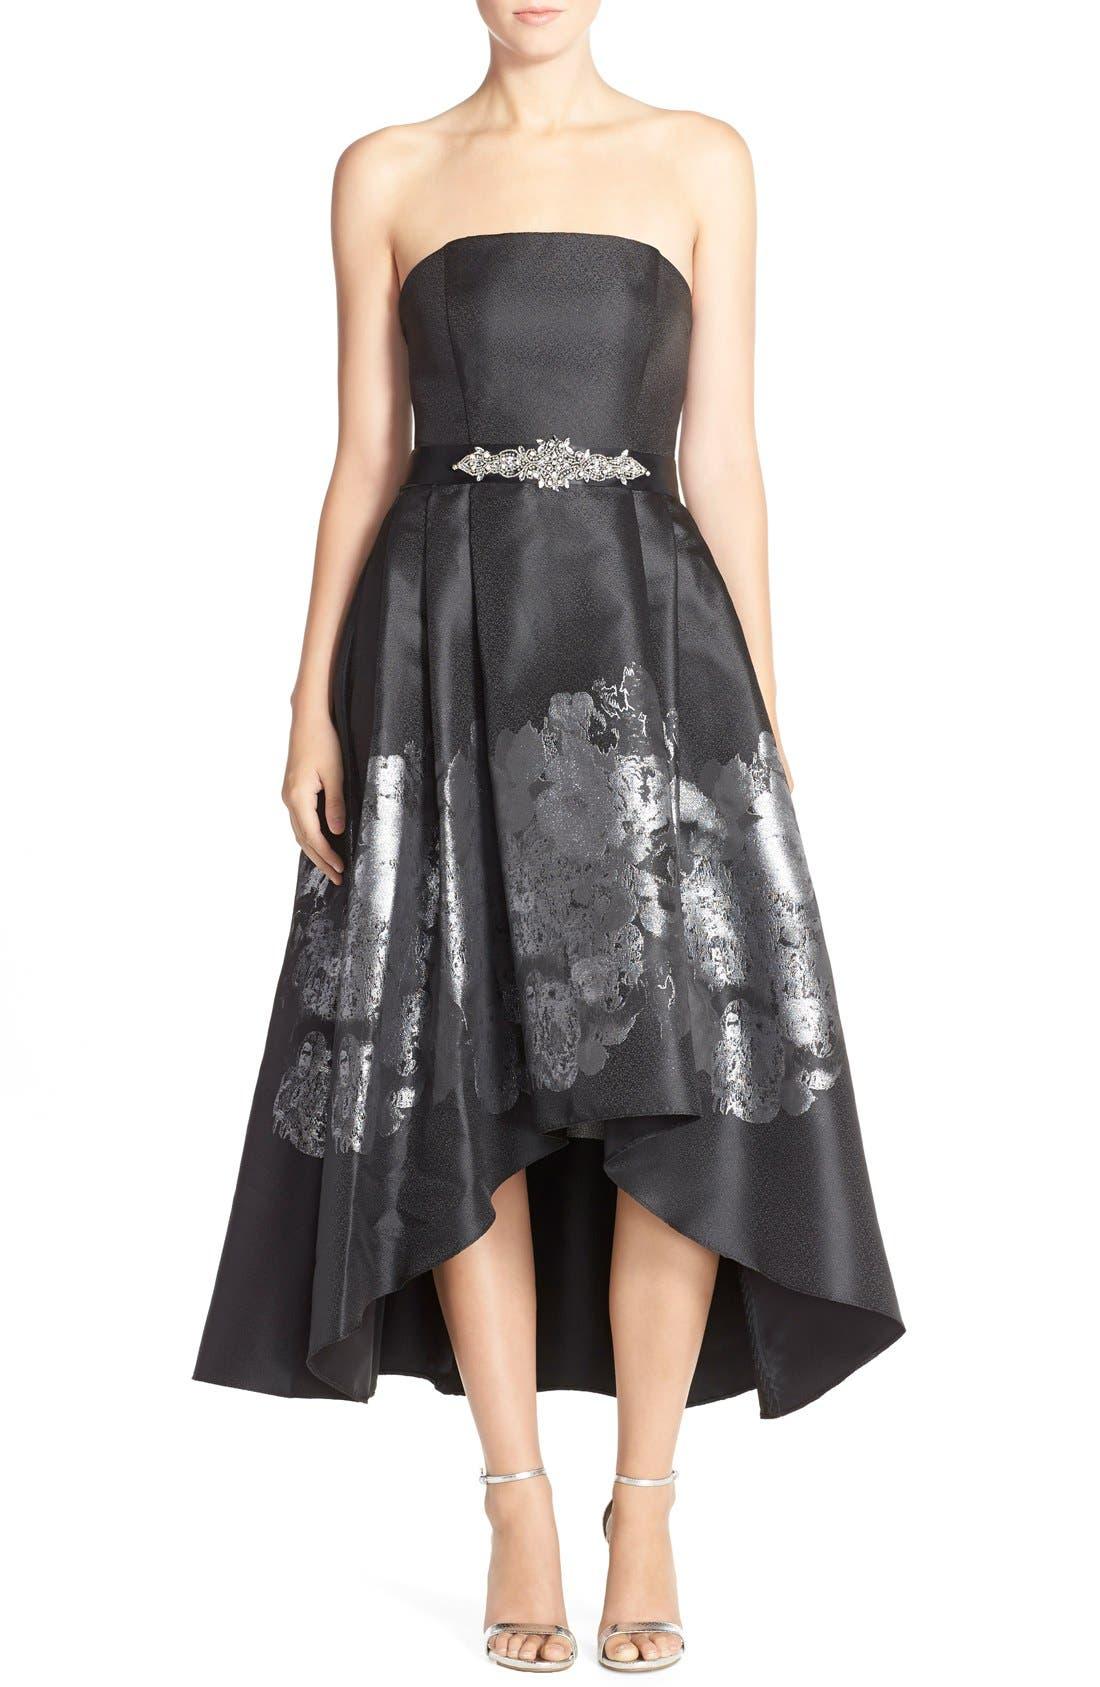 Alternate Image 1 Selected - Betsy & Adam Metallic Jacquard High/Low Fit & Flare Dress